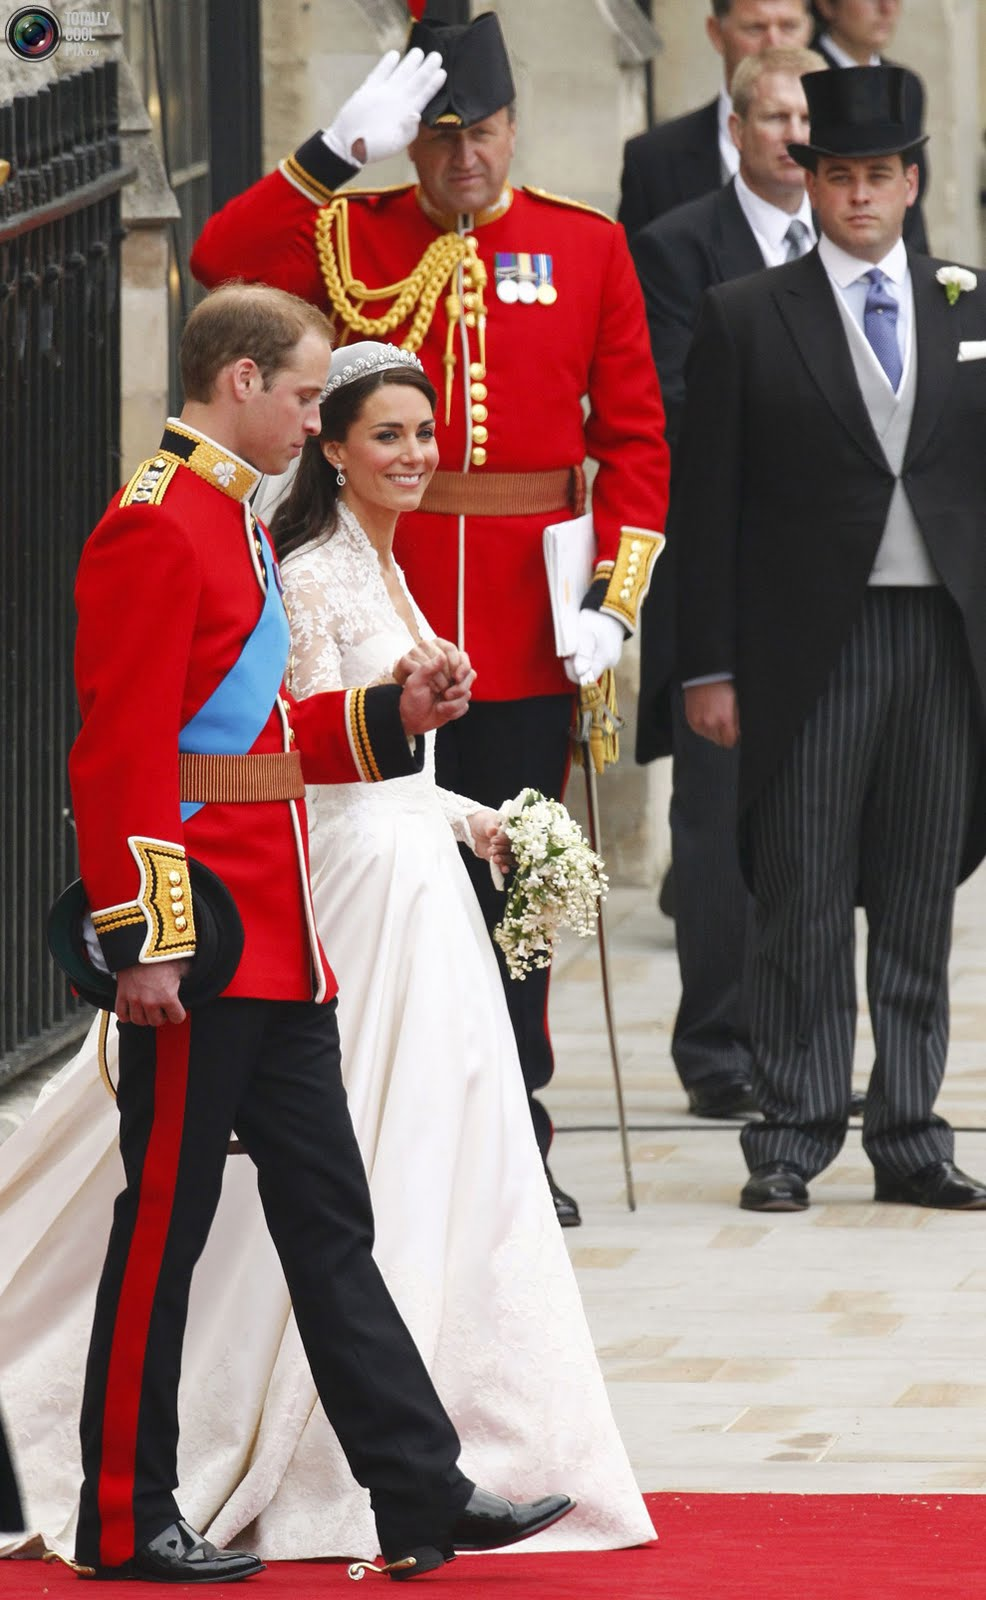 Image Result For Royal Wedding Concept